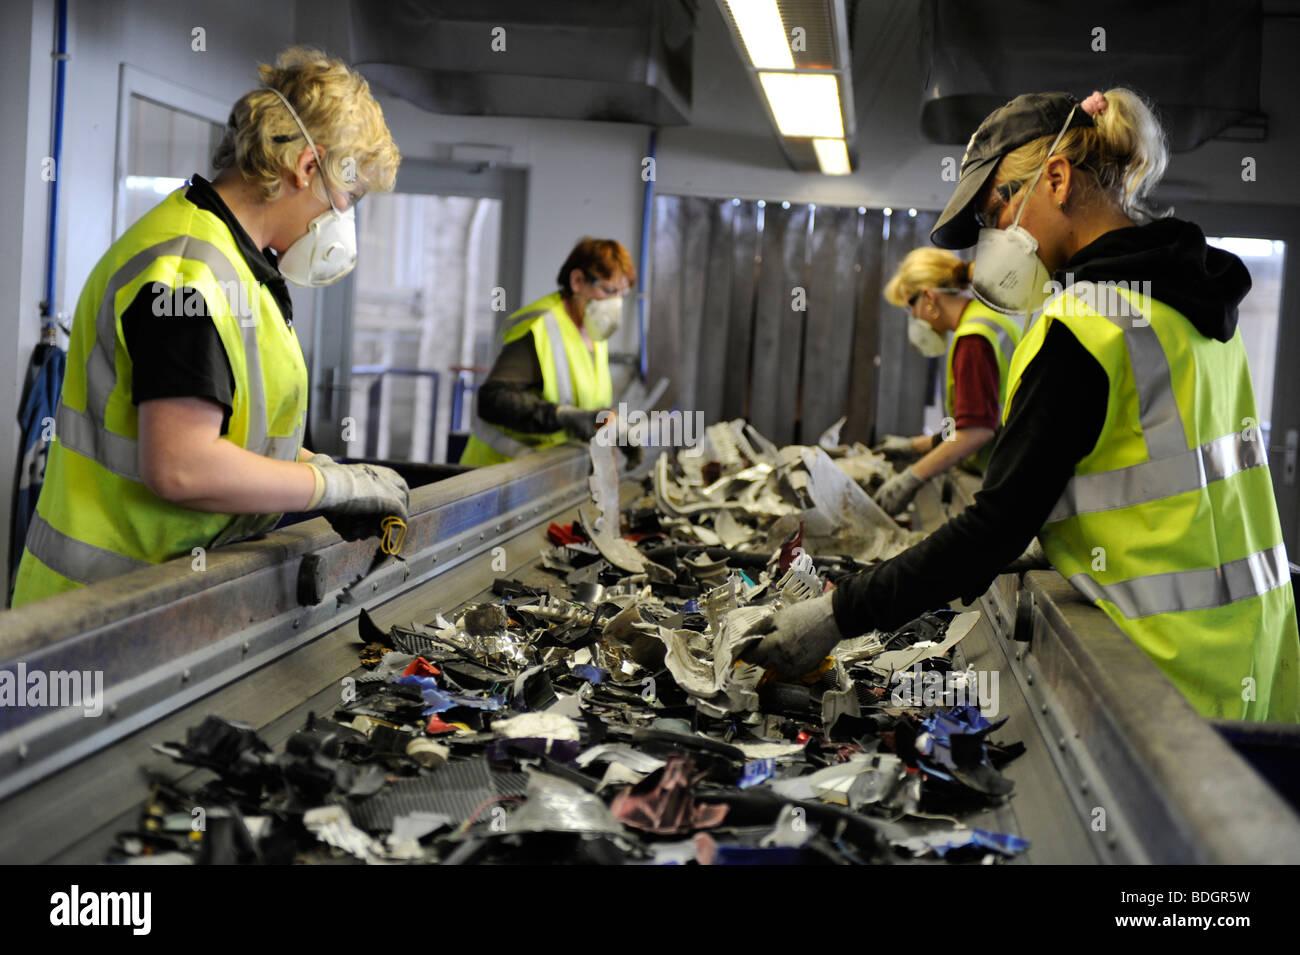 GERMANY HAMBURG recycling of electronic scrap at electronic recycling company TCMG, not used electronic consumer - Stock Image